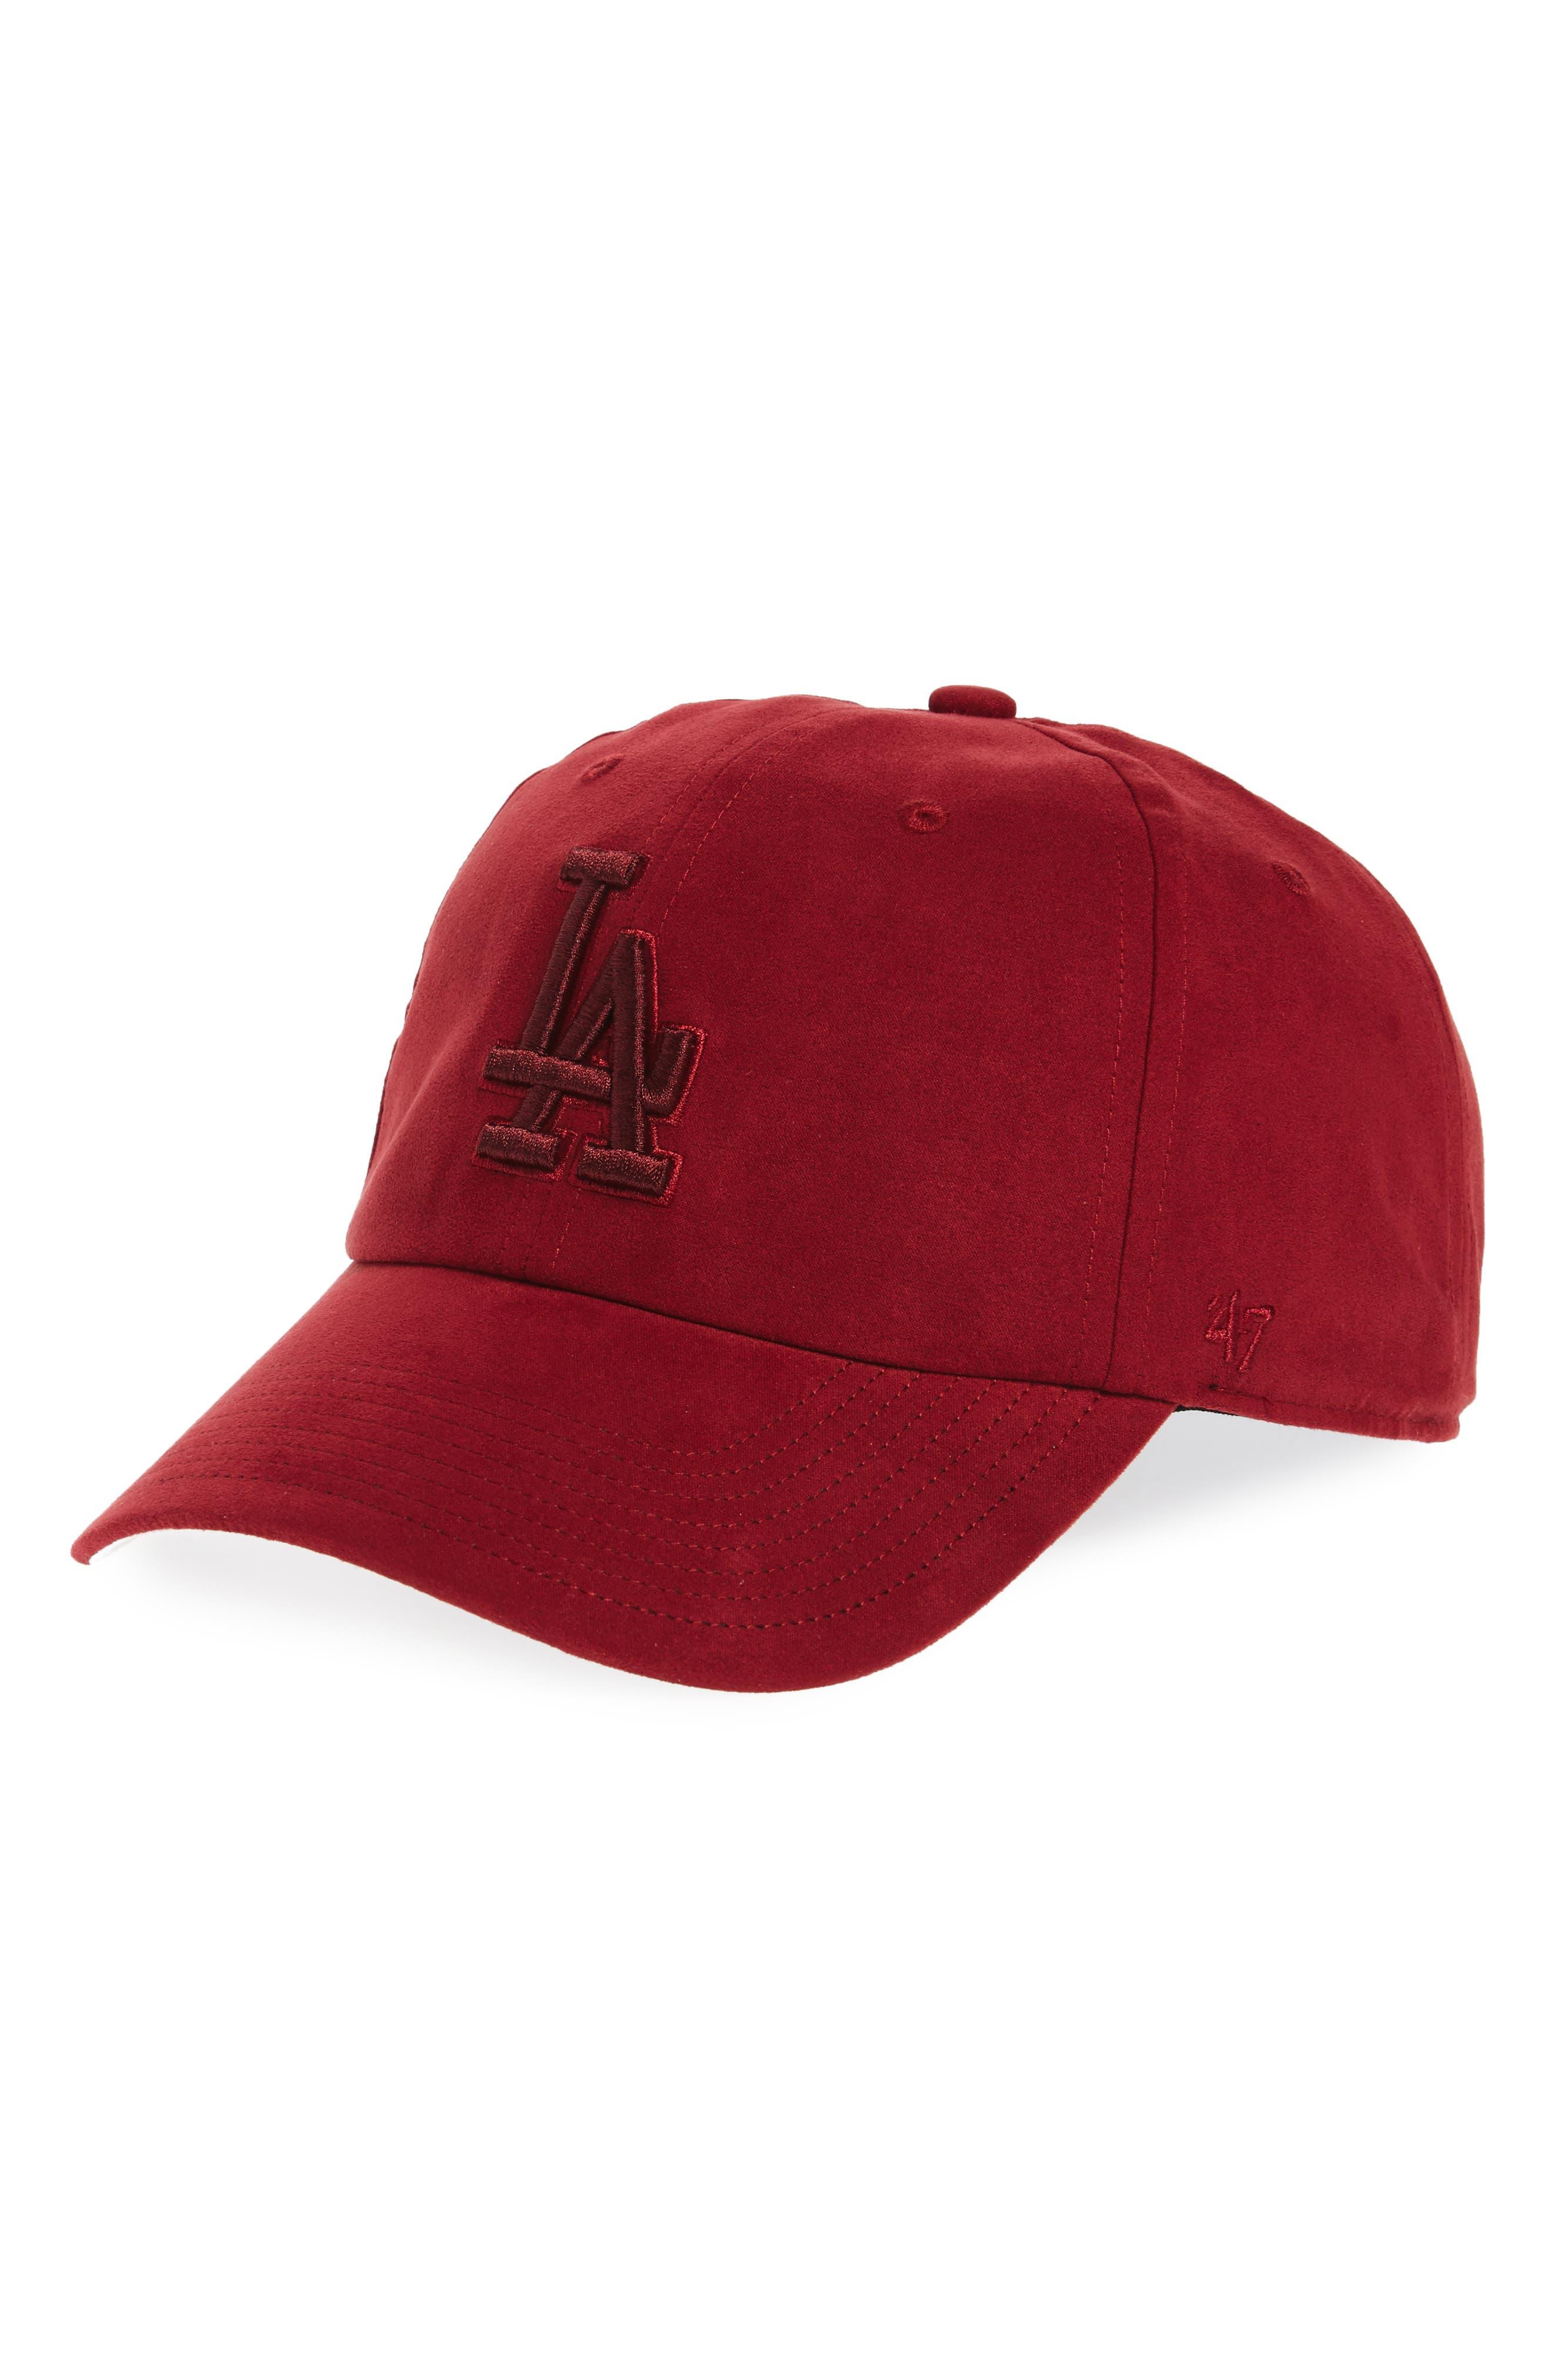 Brand Los Angeles Dodgers Baseball Cap,                         Main,                         color, Maroon